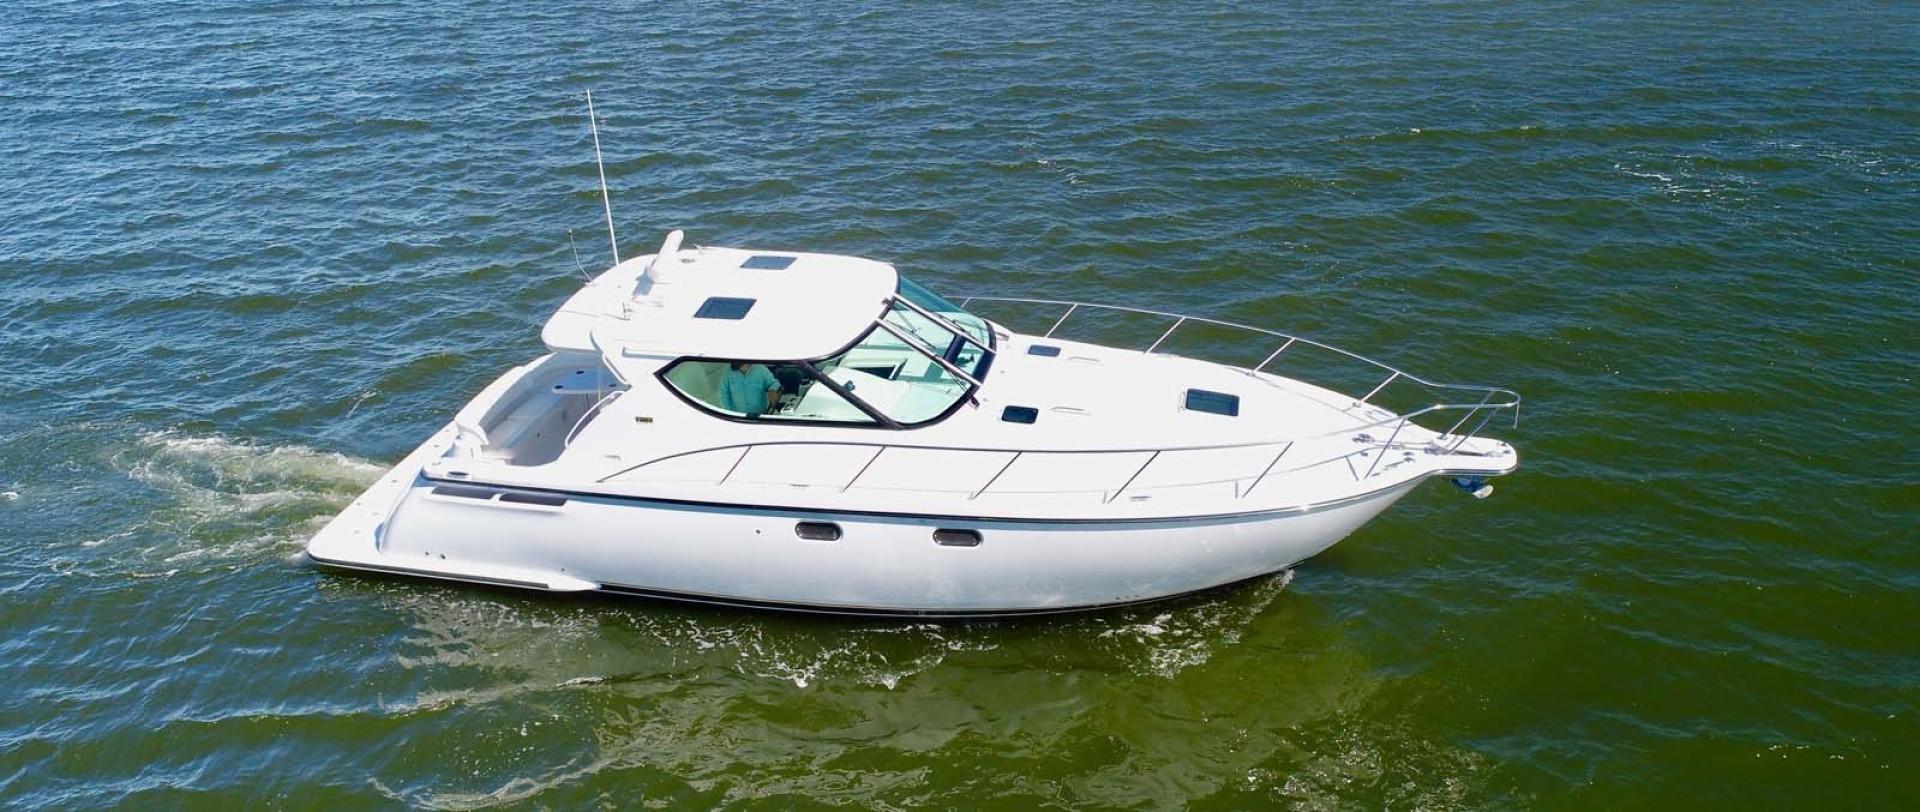 Tiara Yachts-4300 Sovran 2007-Lisa Anne Perdido Key-Florida-United States-1141688 | Thumbnail